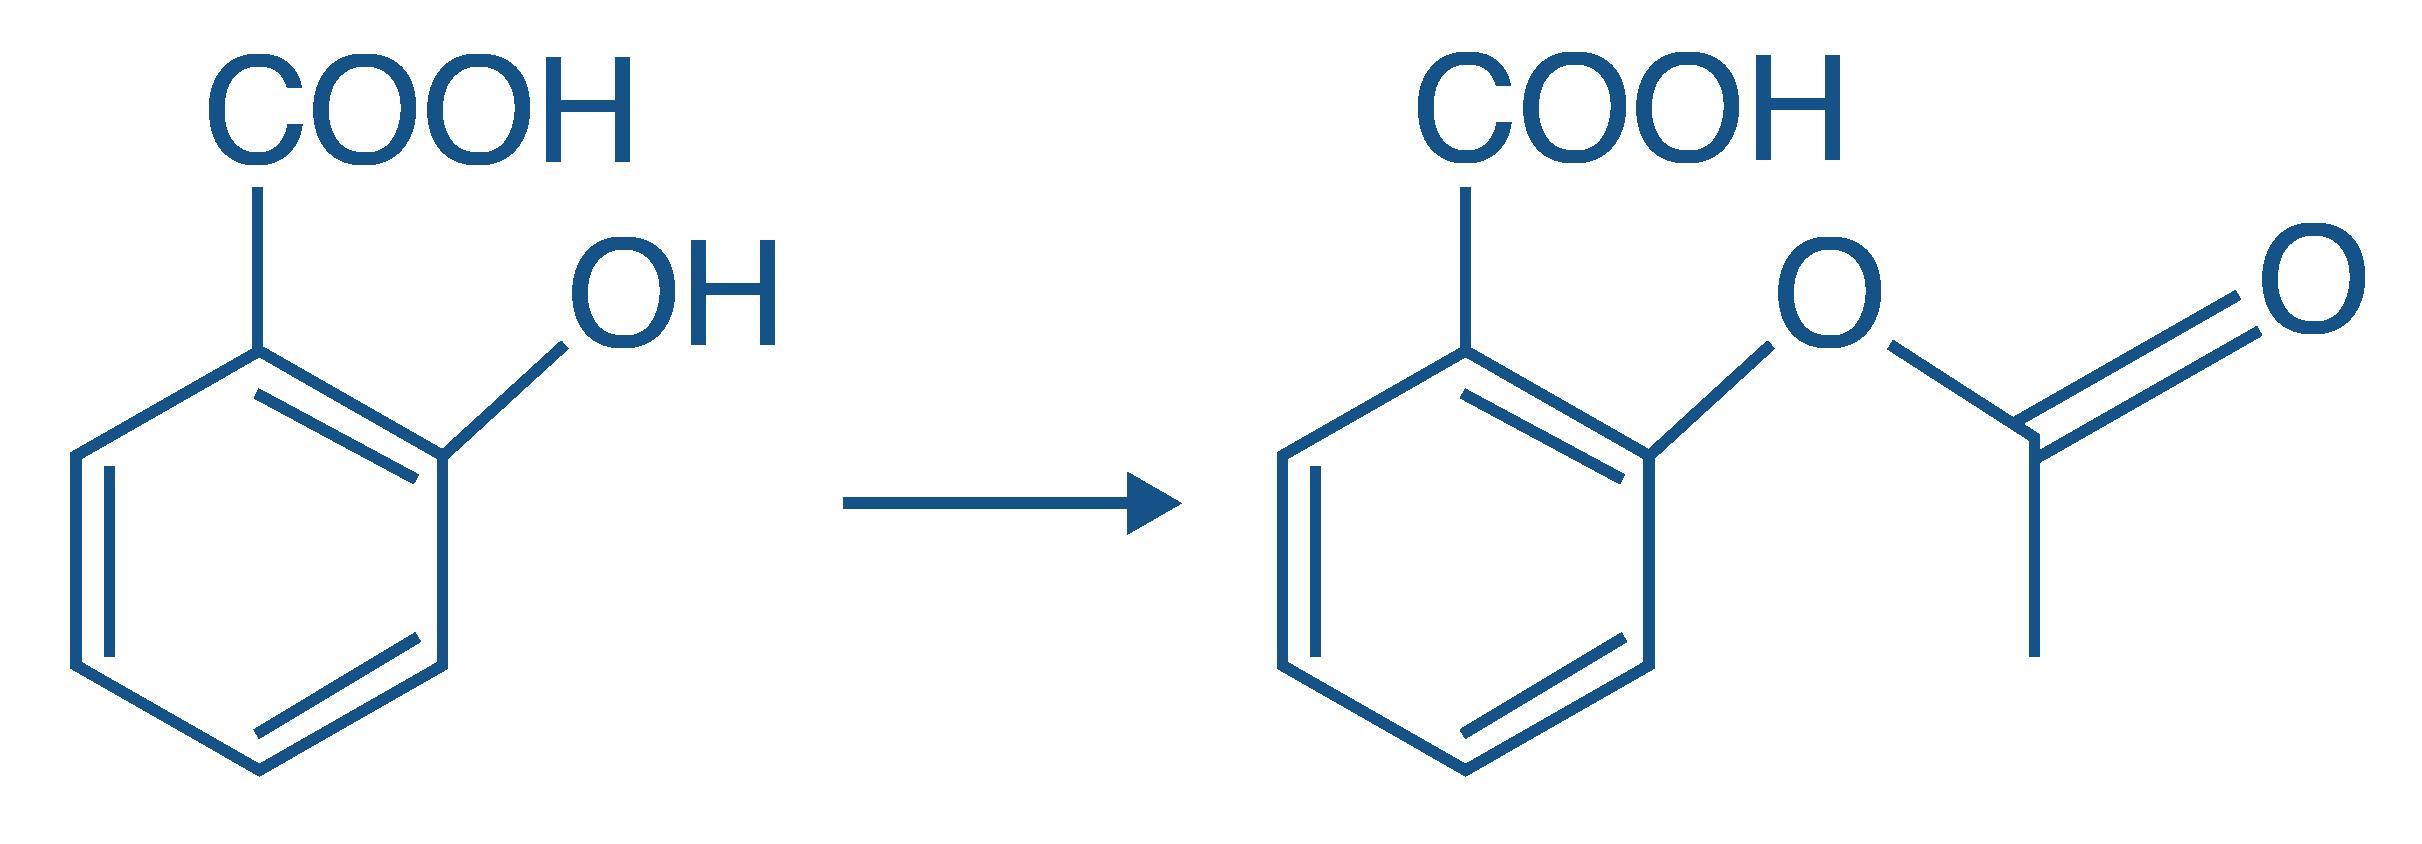 Formation de l'aspirine